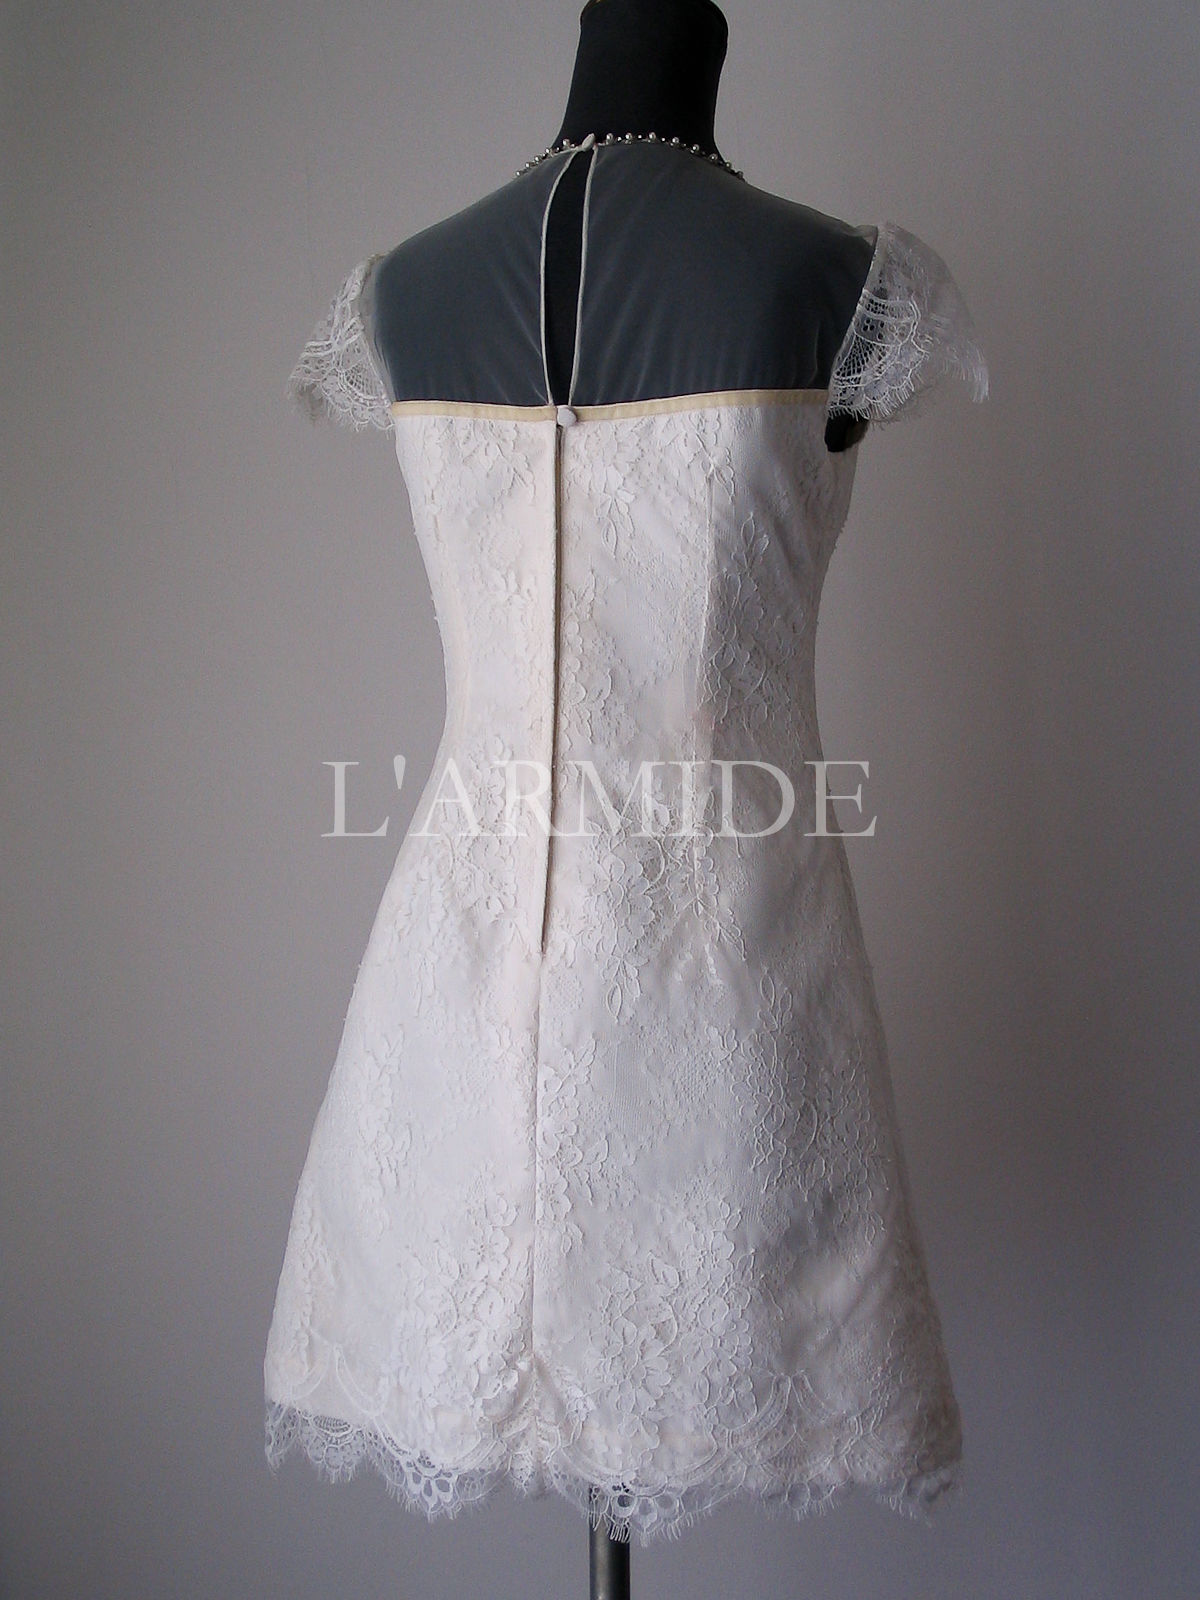 vestido-de-novia-corto-civil-buenos-aires-argentina-larmide-IMG_5173.jpg